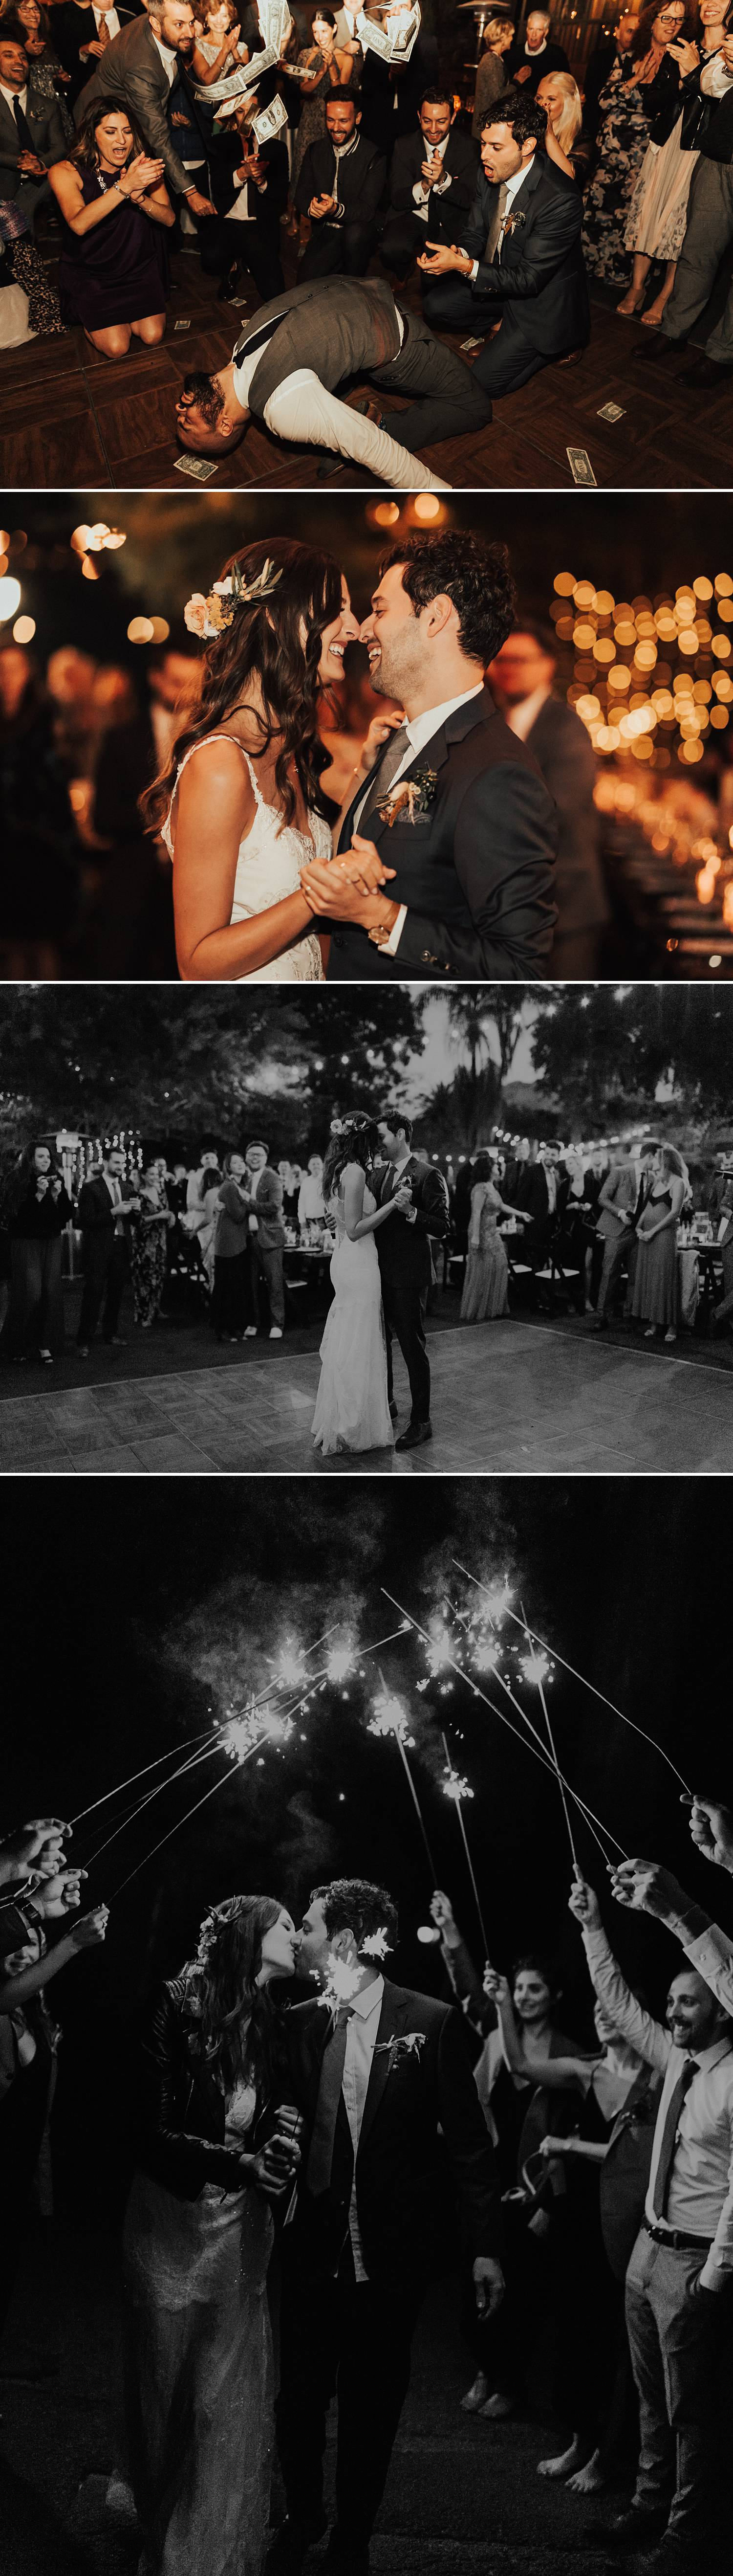 sandiego wedding photographer_0015.jpg